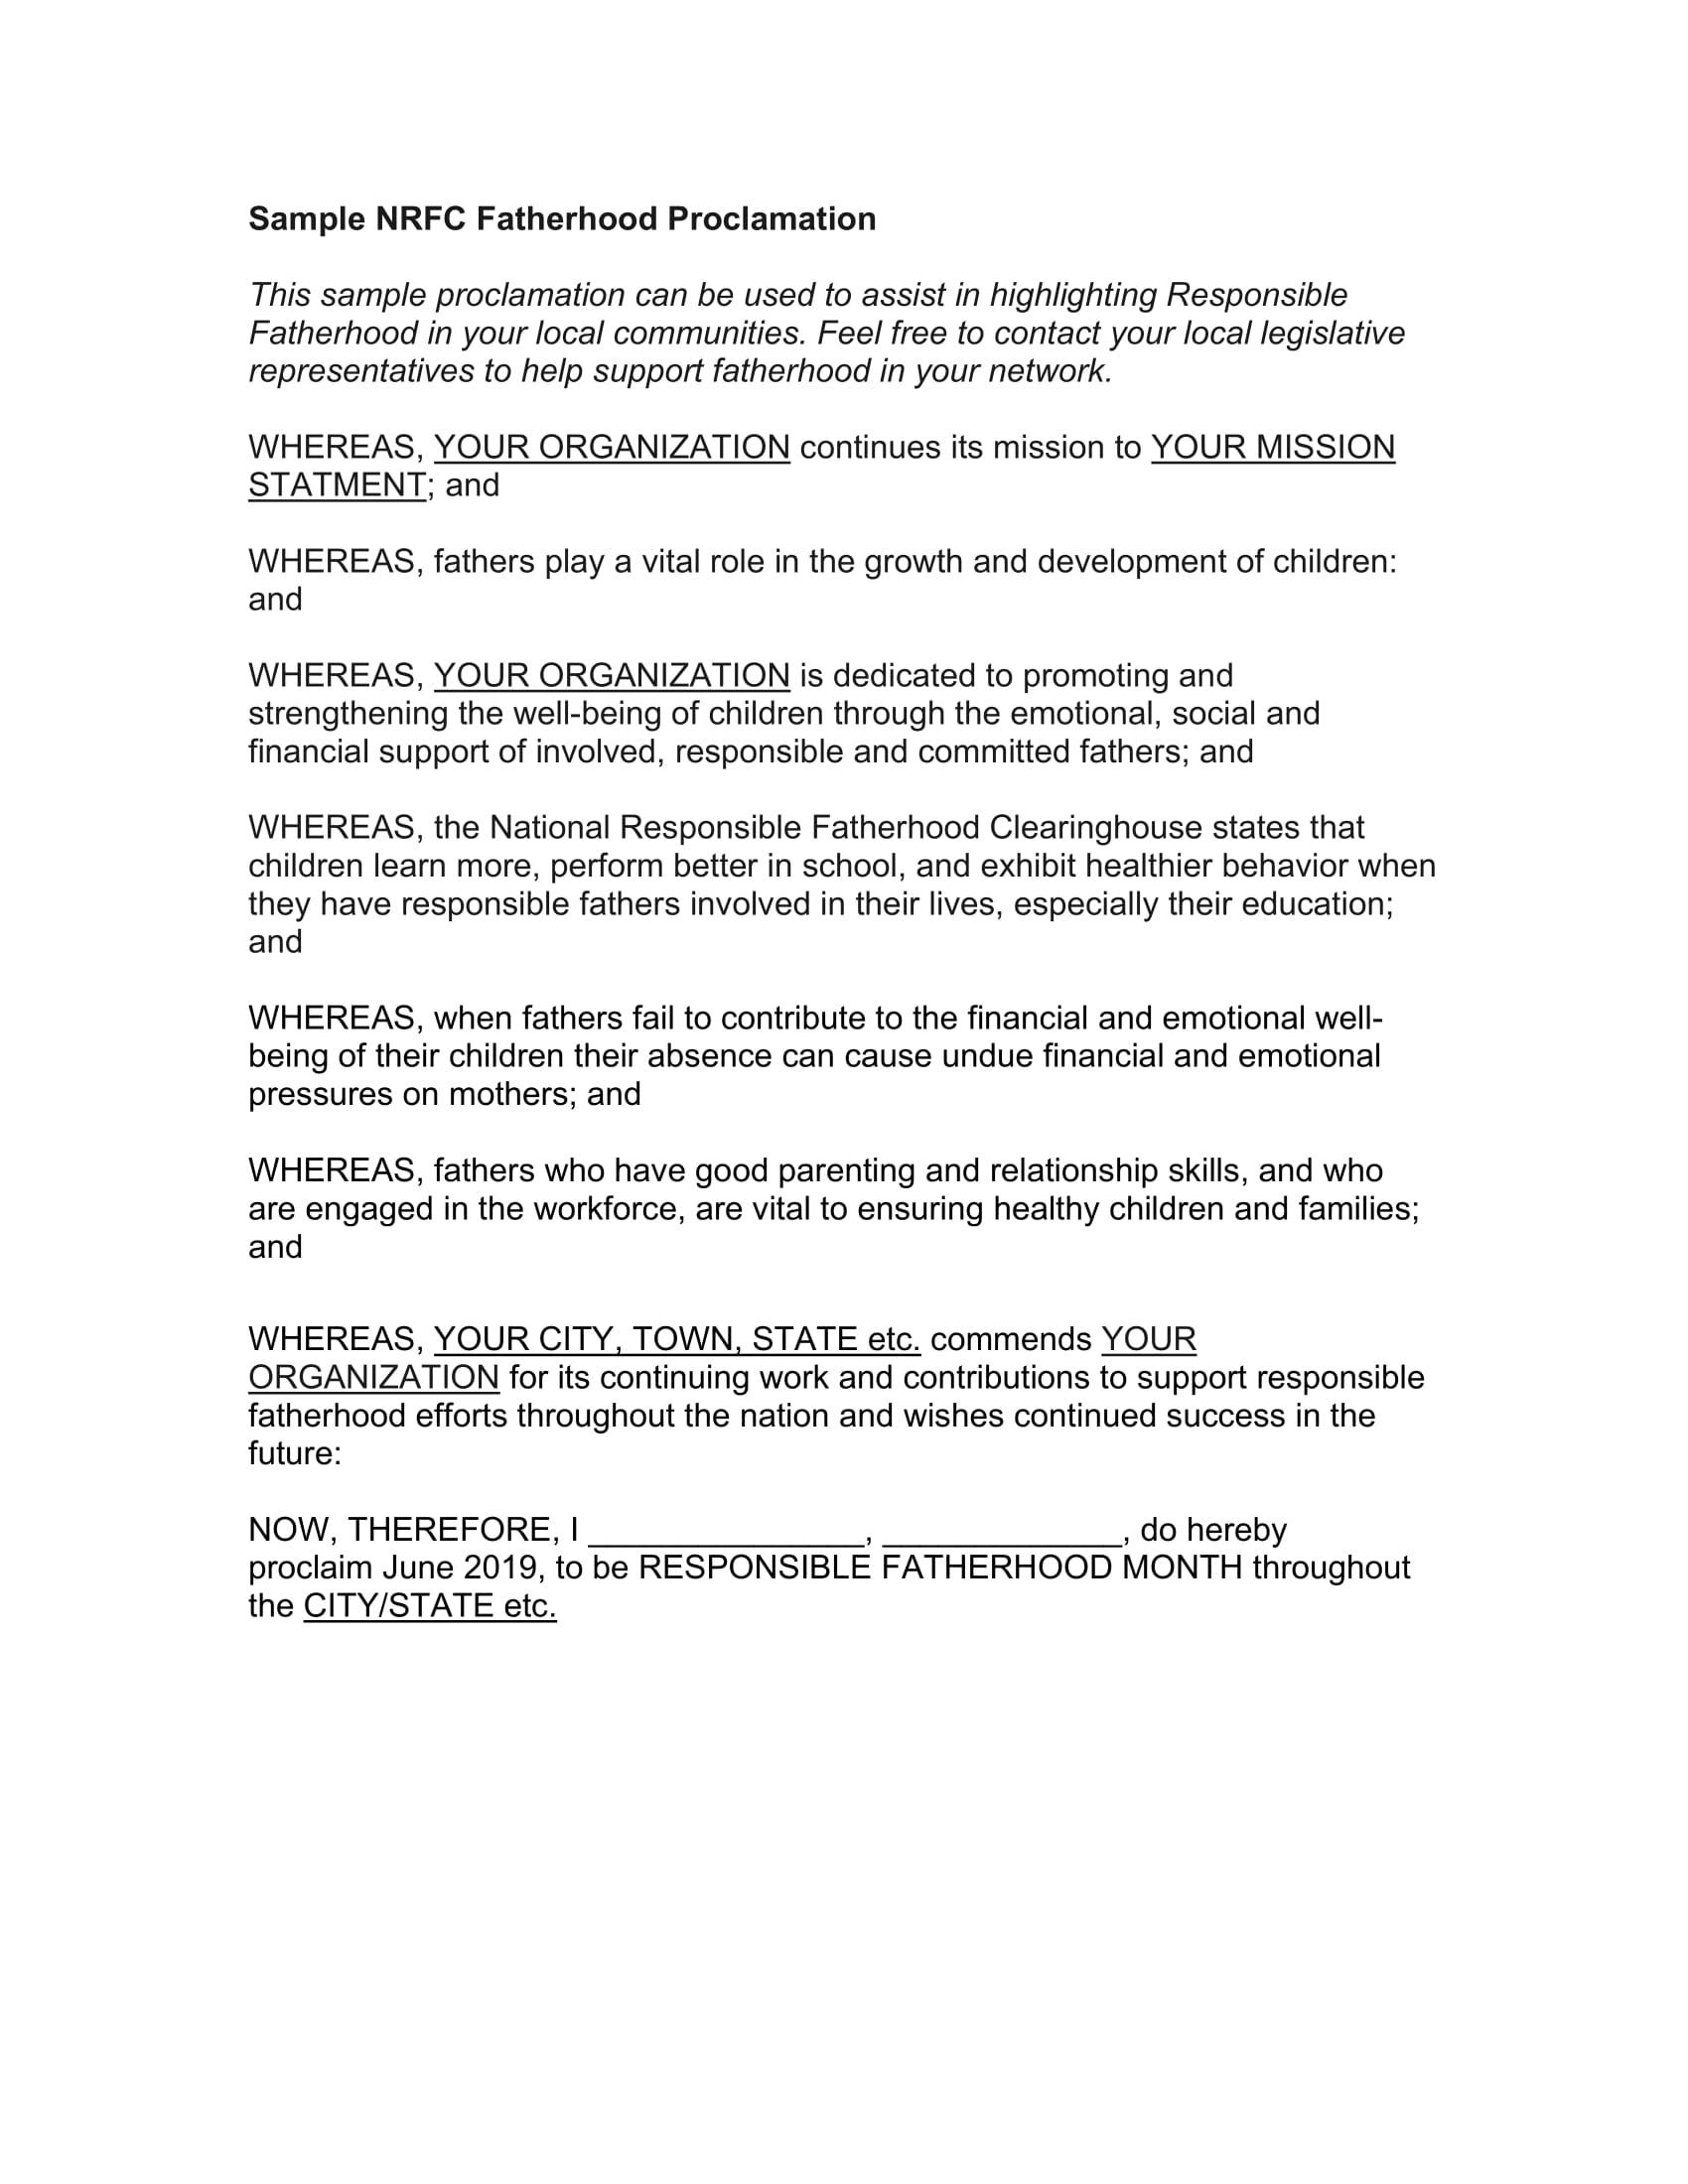 NRFC Fatherhood Proclamation-JPG